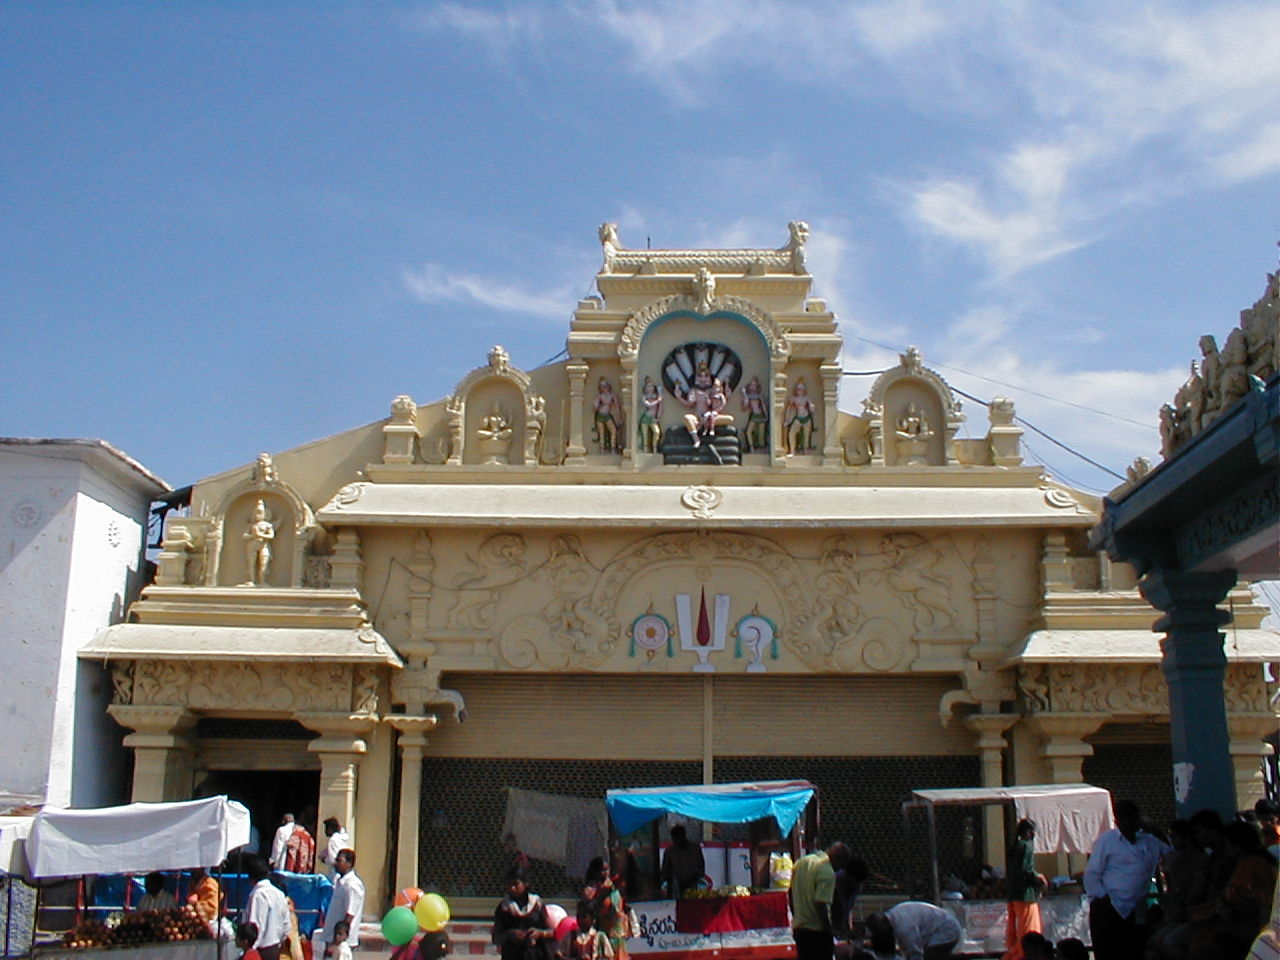 Amazing Place in Telangana-Yadagirigutta Temple